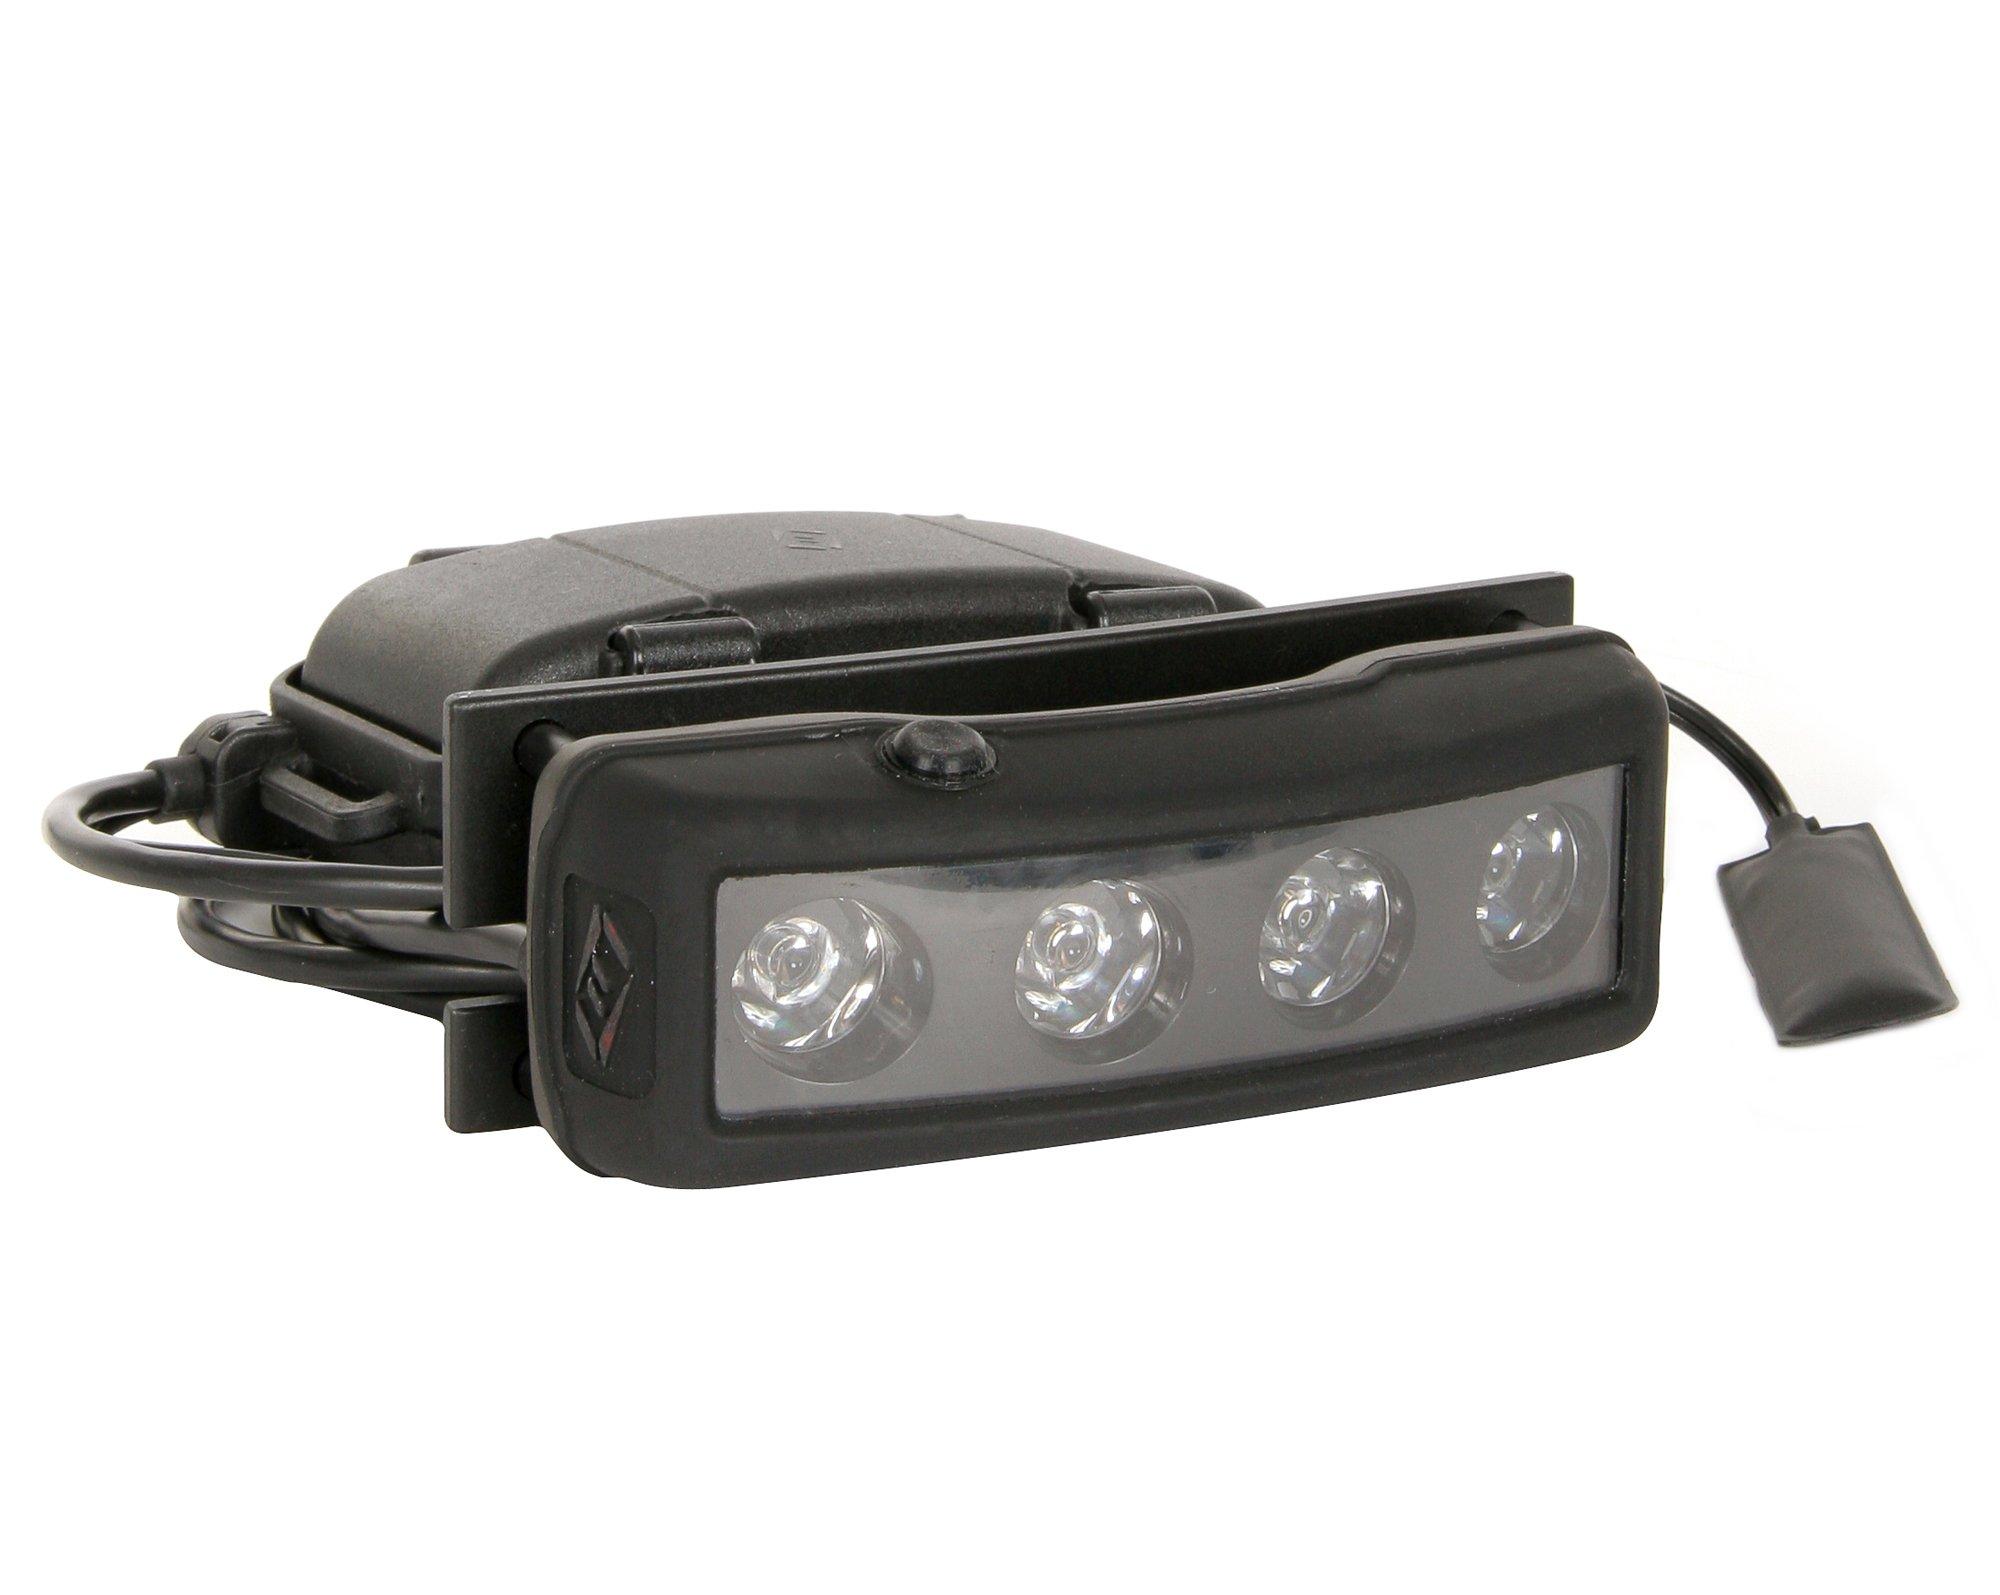 FoxFury 500-329 PRO III Led Shield Light Double Switch, 560 Lumens by FoxFury